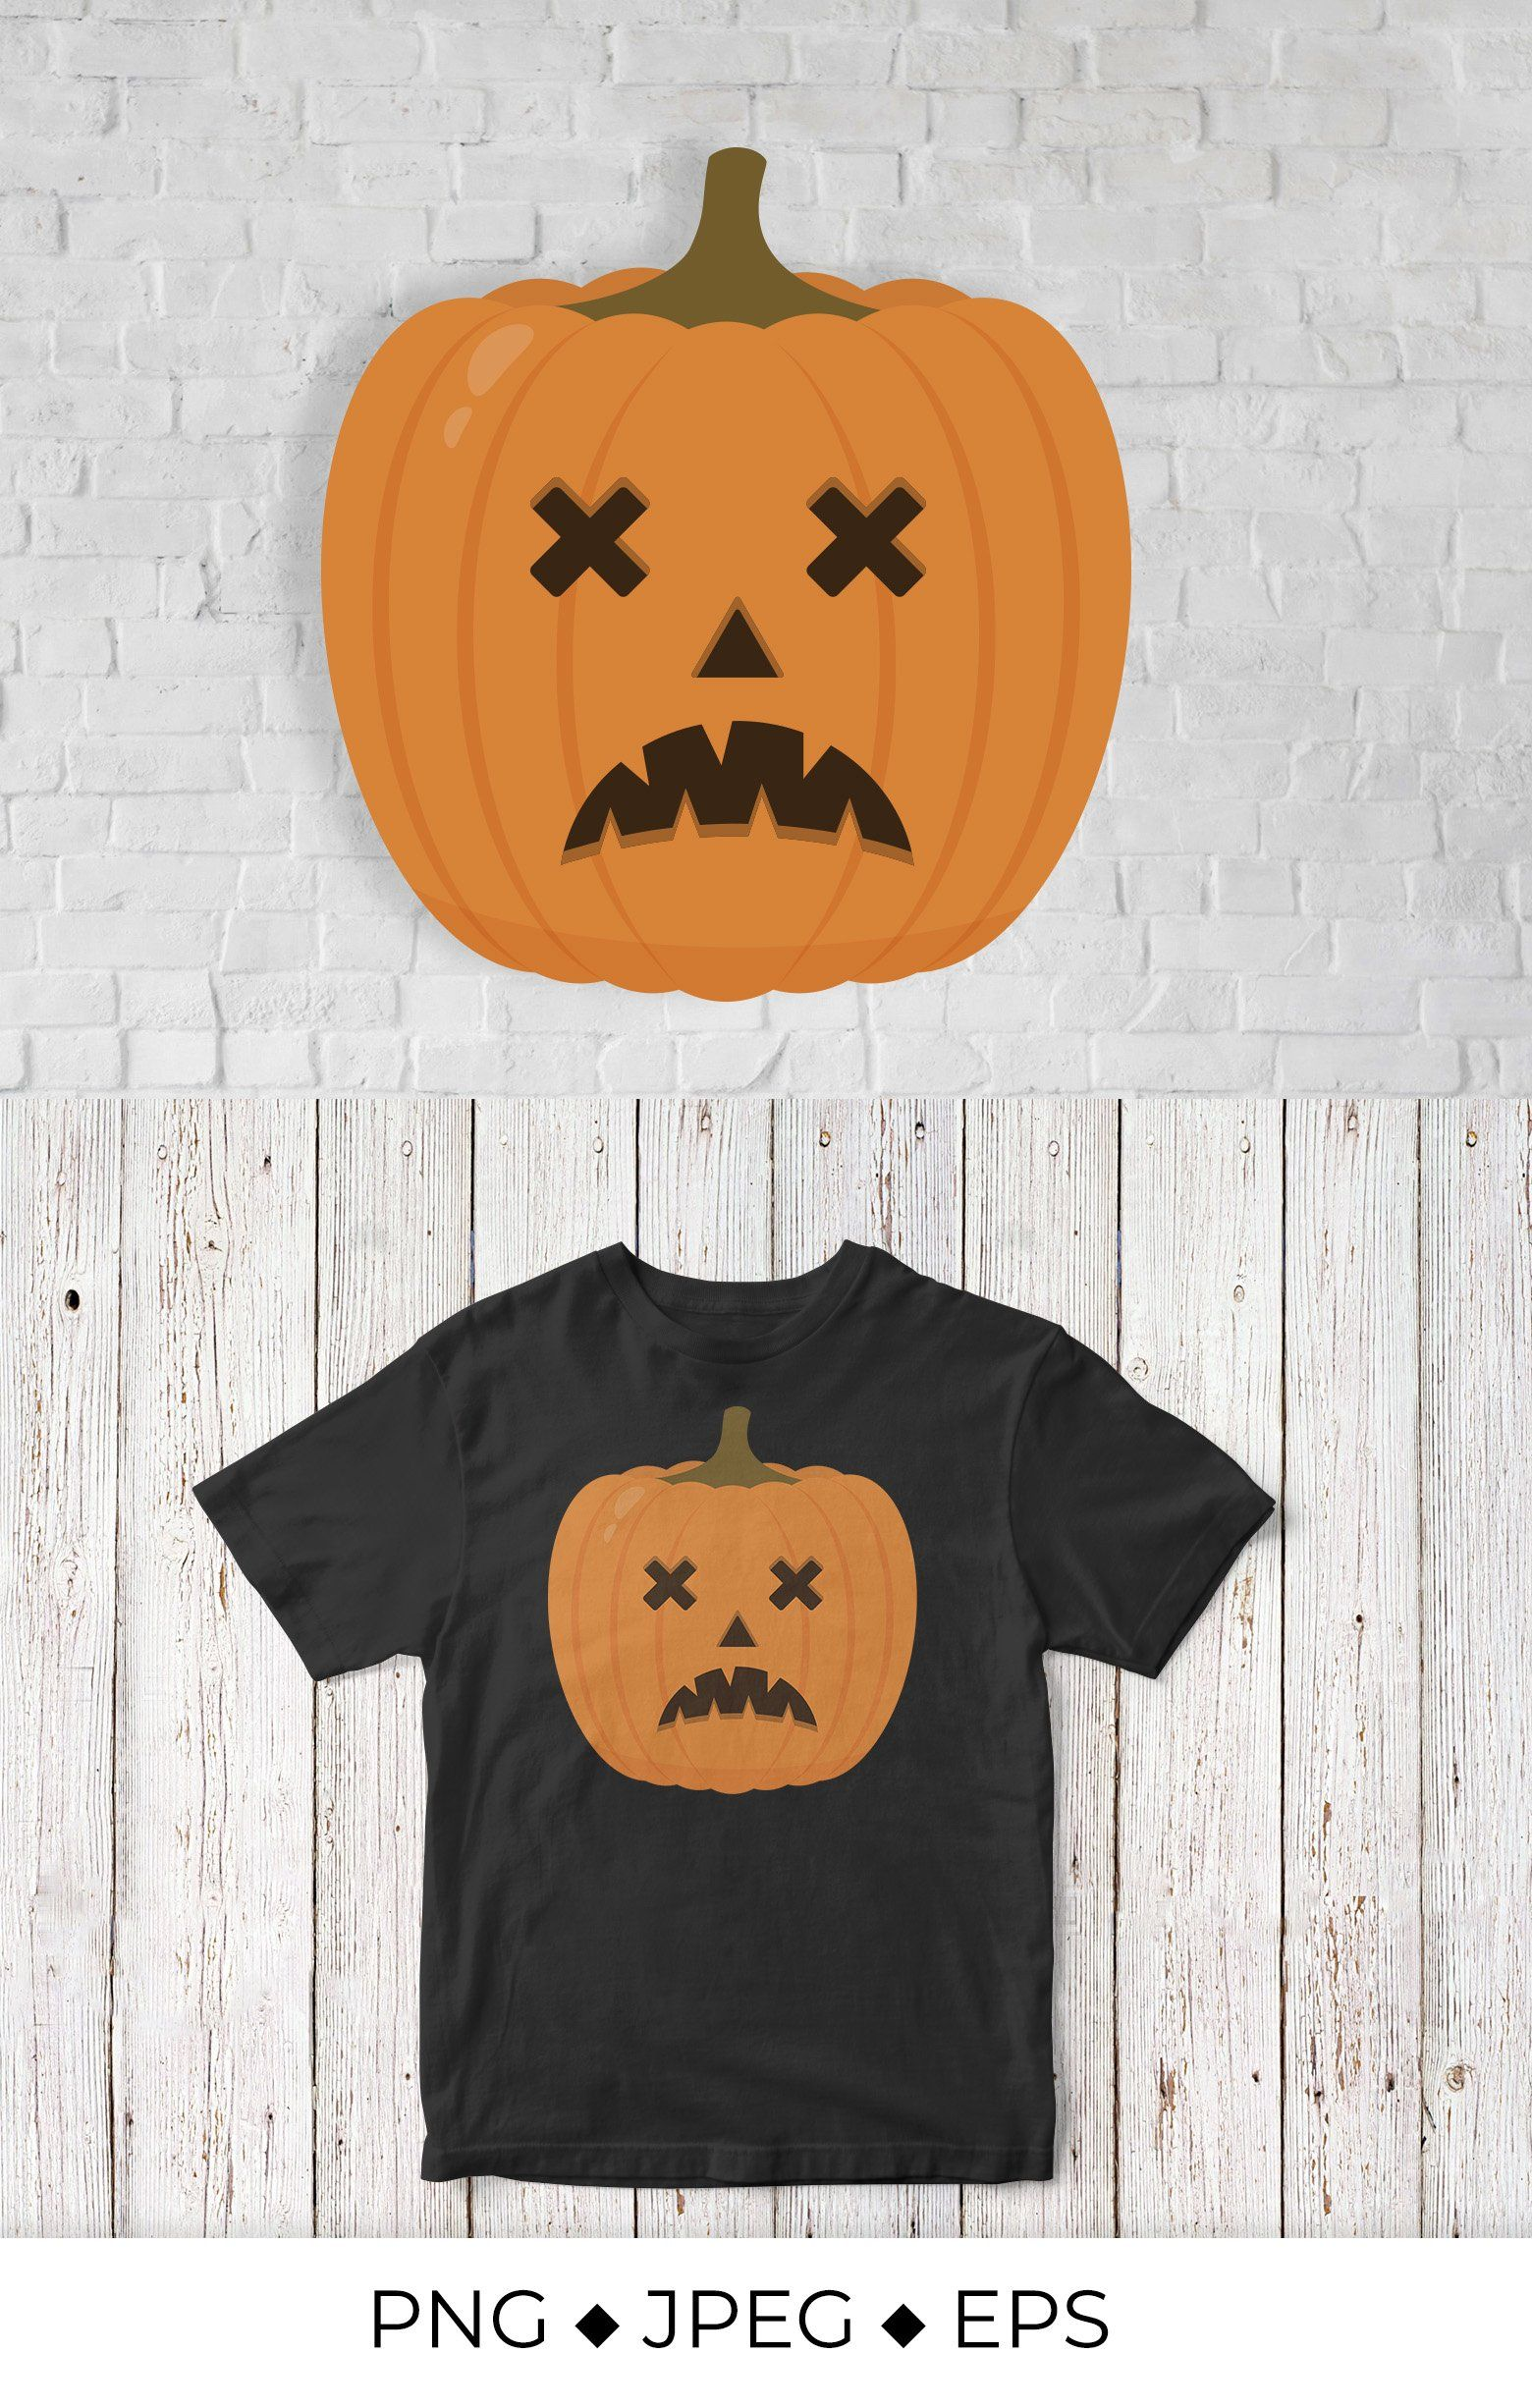 Halloween Pumpkin With Scary Face Jack O Lantern 960241 Sublimation Design Bundles Halloween Pumpkins Scary Faces Jack O Lantern